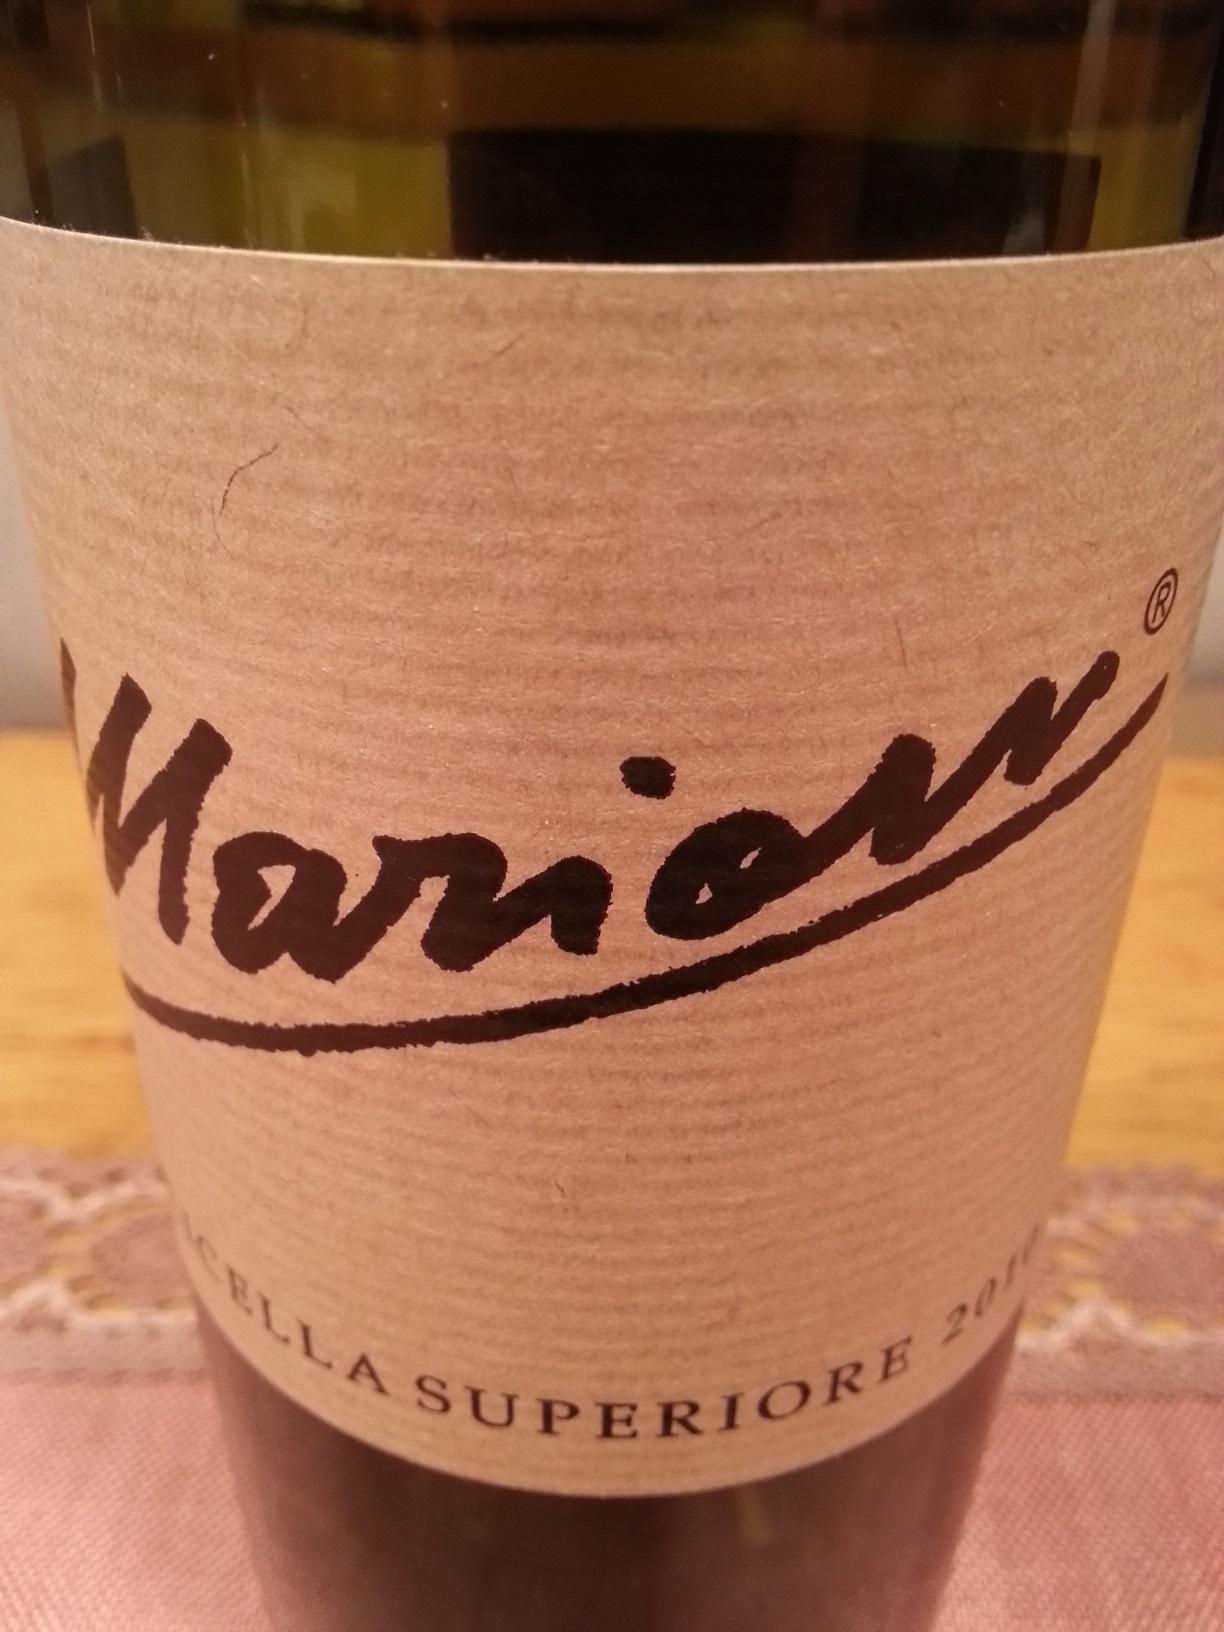 2010 Marion Valpolicella Superiore | Marion